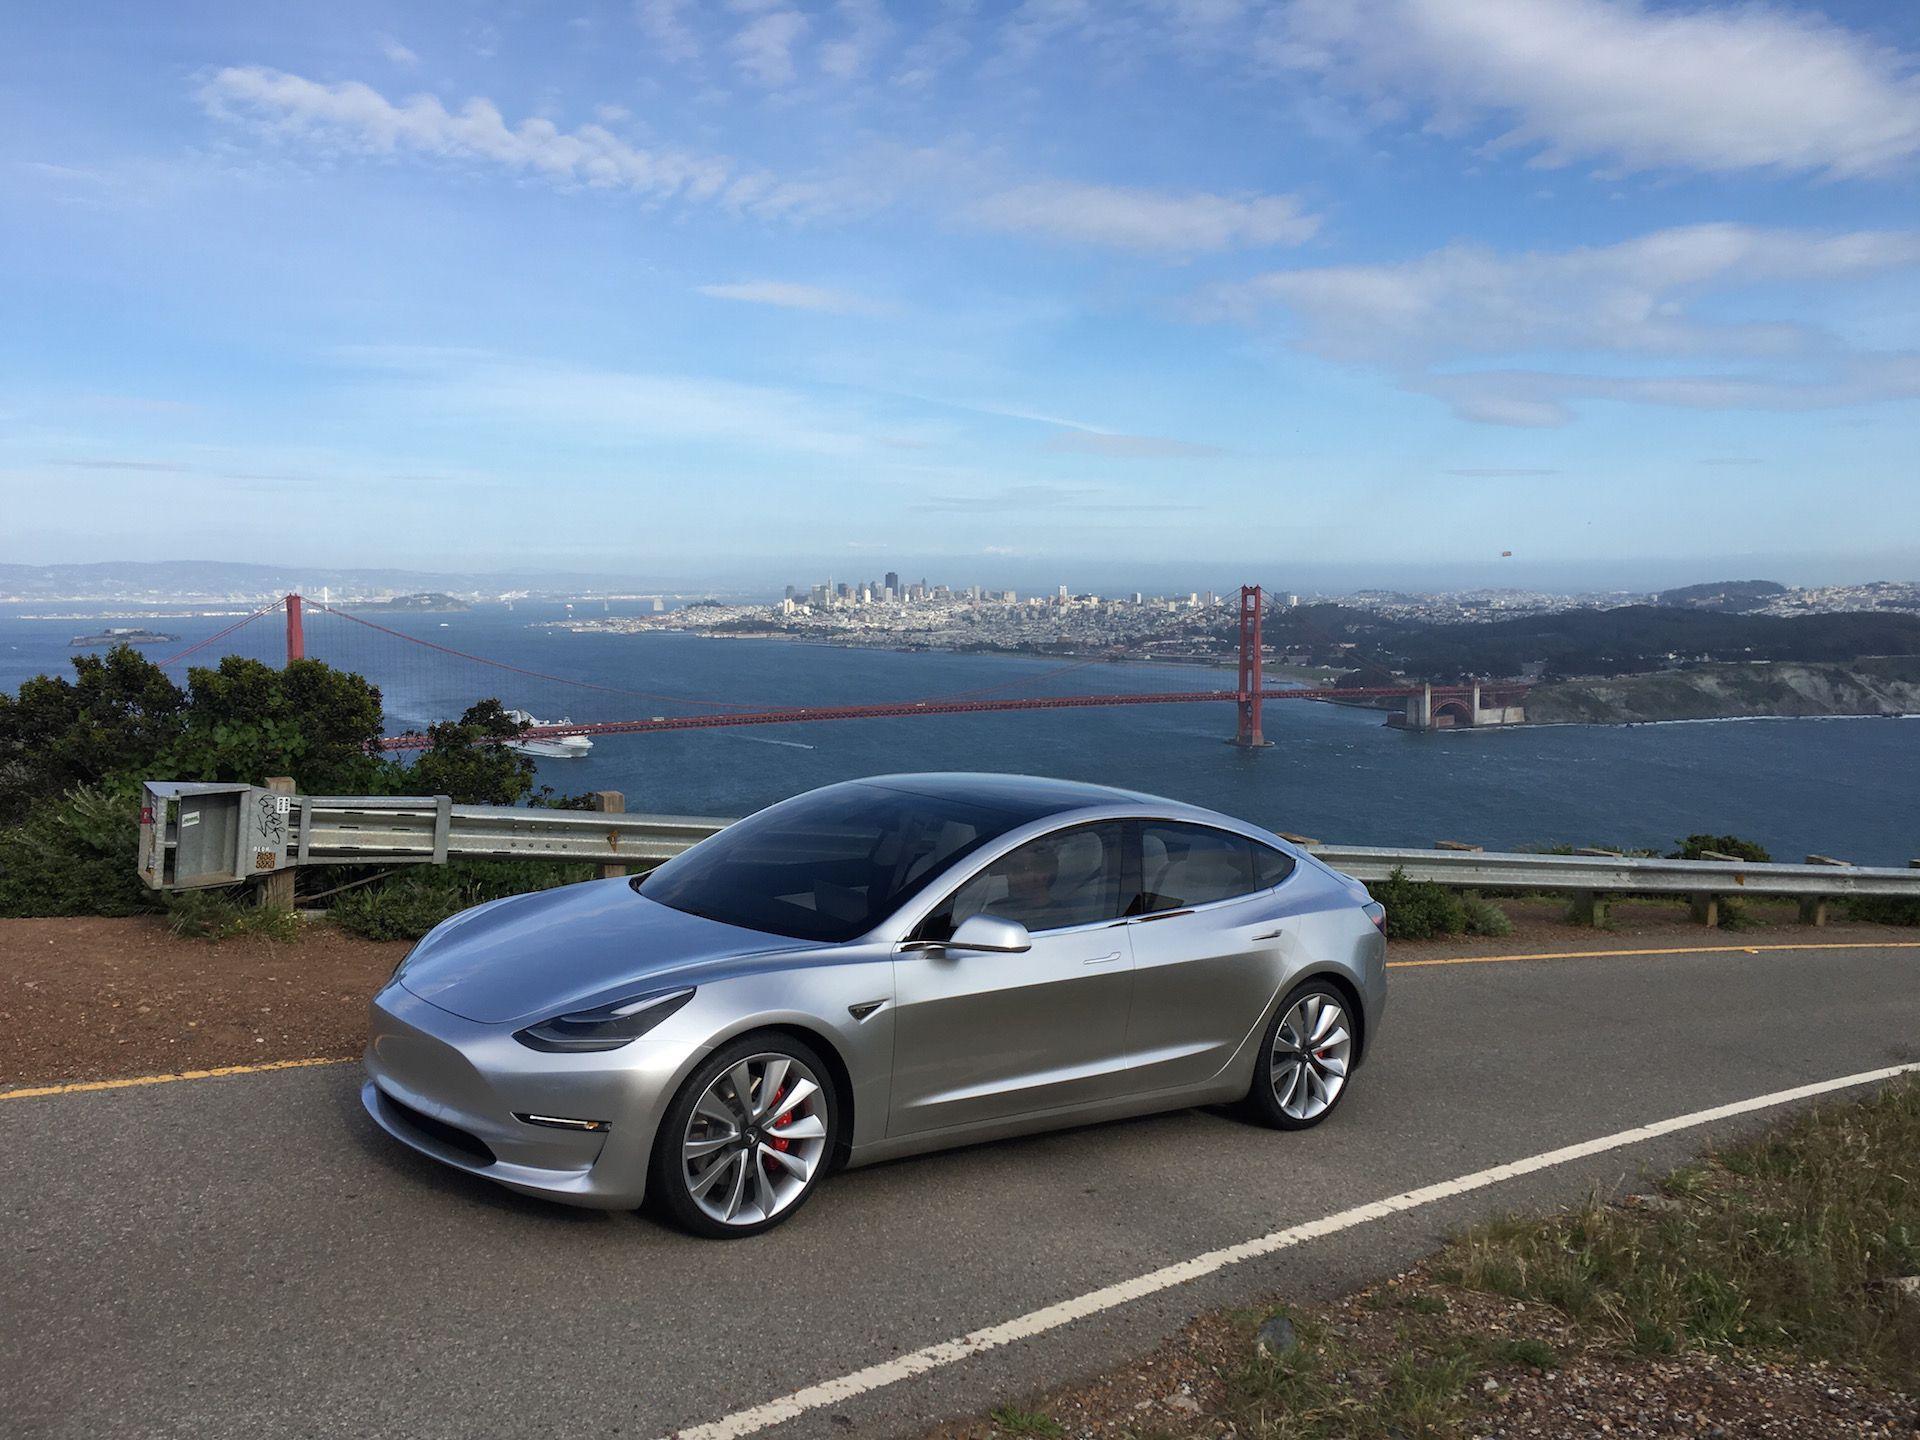 Tesla Model 3 Wallpapers Top Free Tesla Model 3 Backgrounds Wallpaperaccess